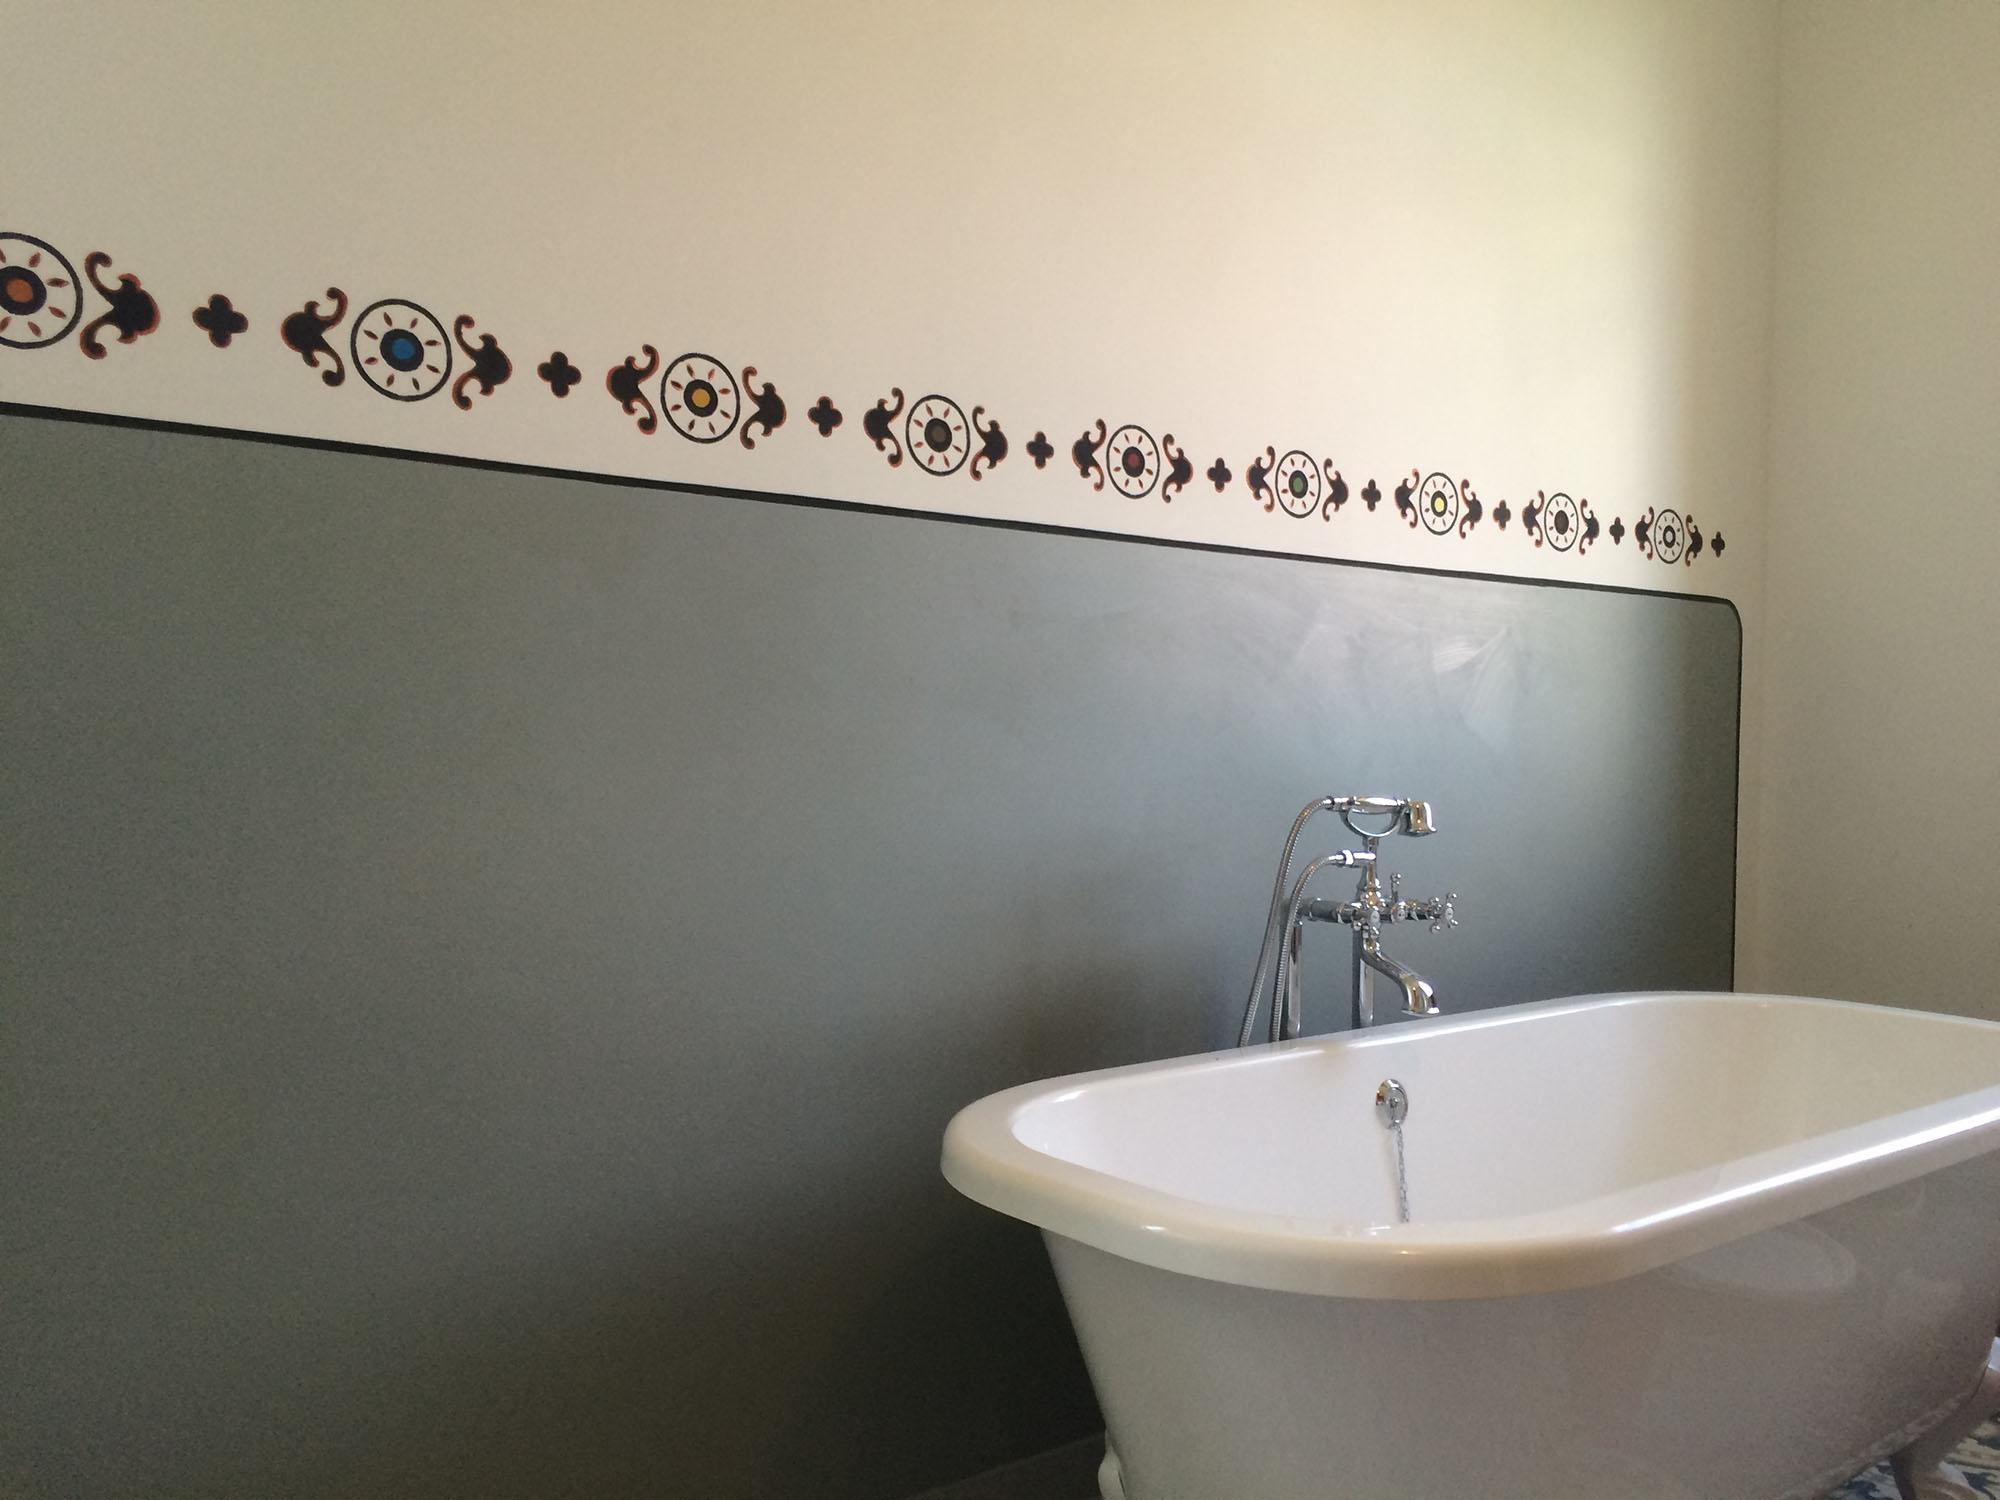 Cool Gestaltung Badezimmer Gallery Of